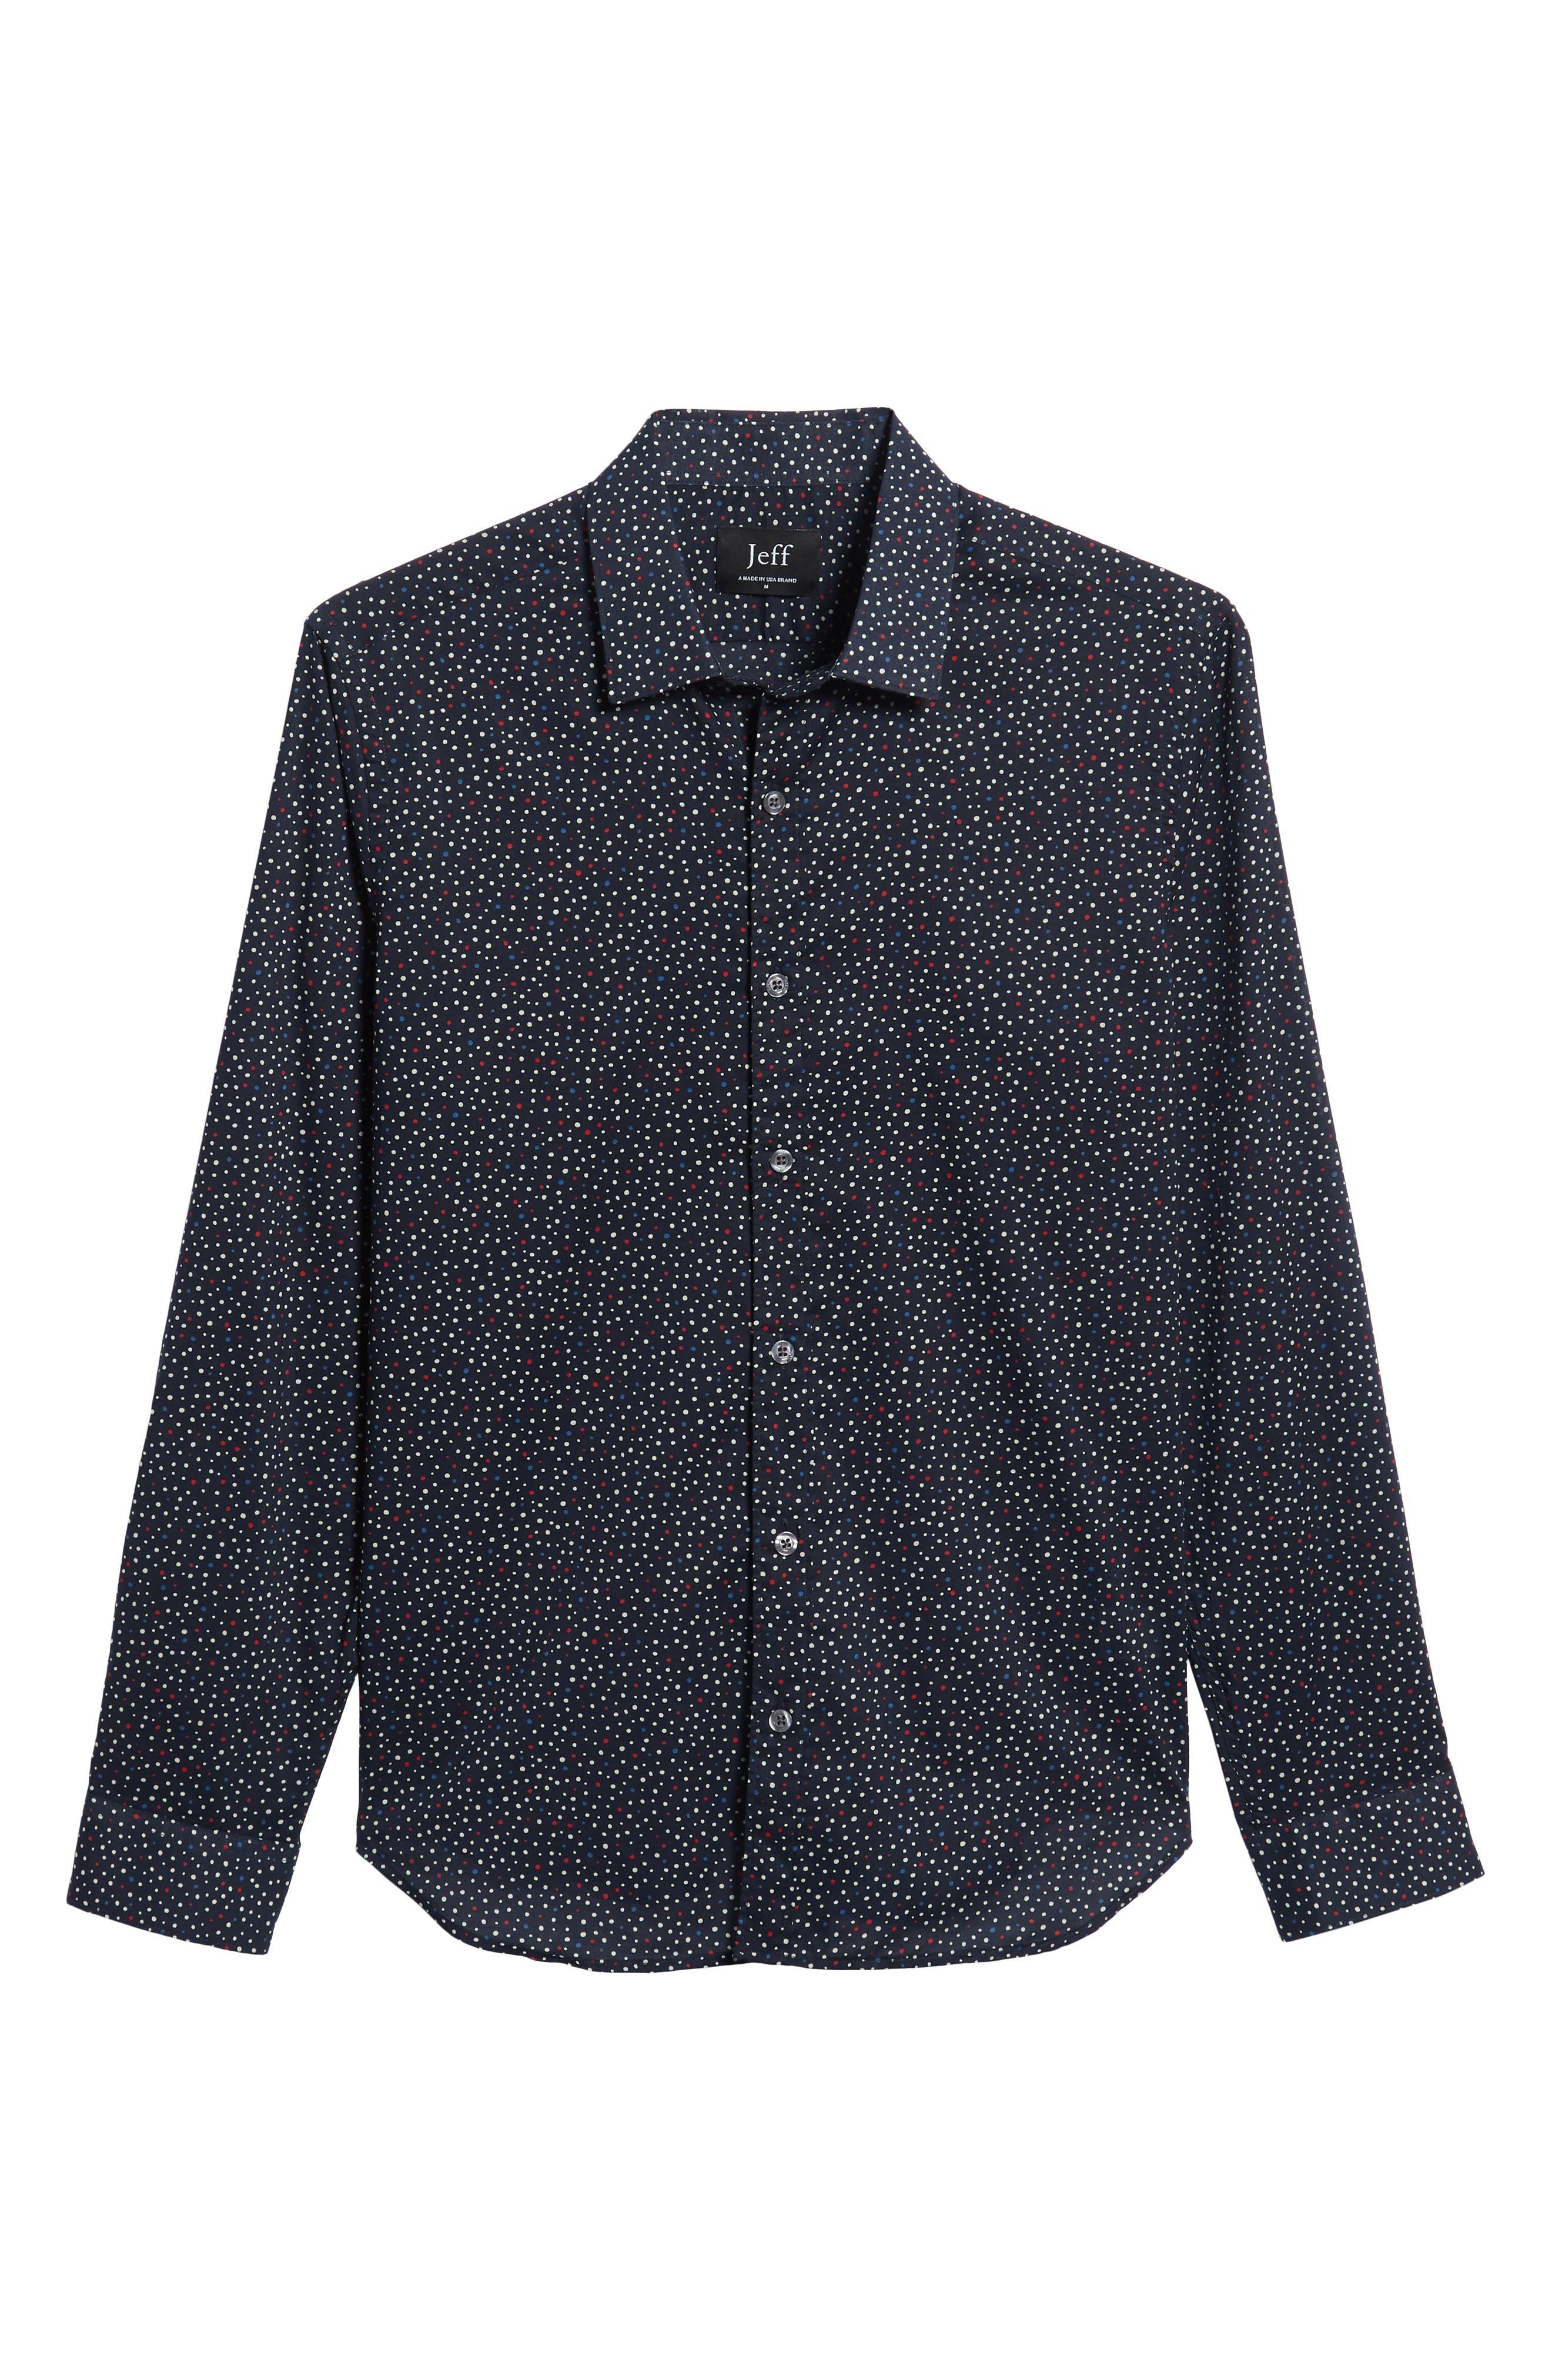 Jenks Slim Fit Long Sleeve Sport Shirt,                             Alternate thumbnail 5, color,                             BLACK